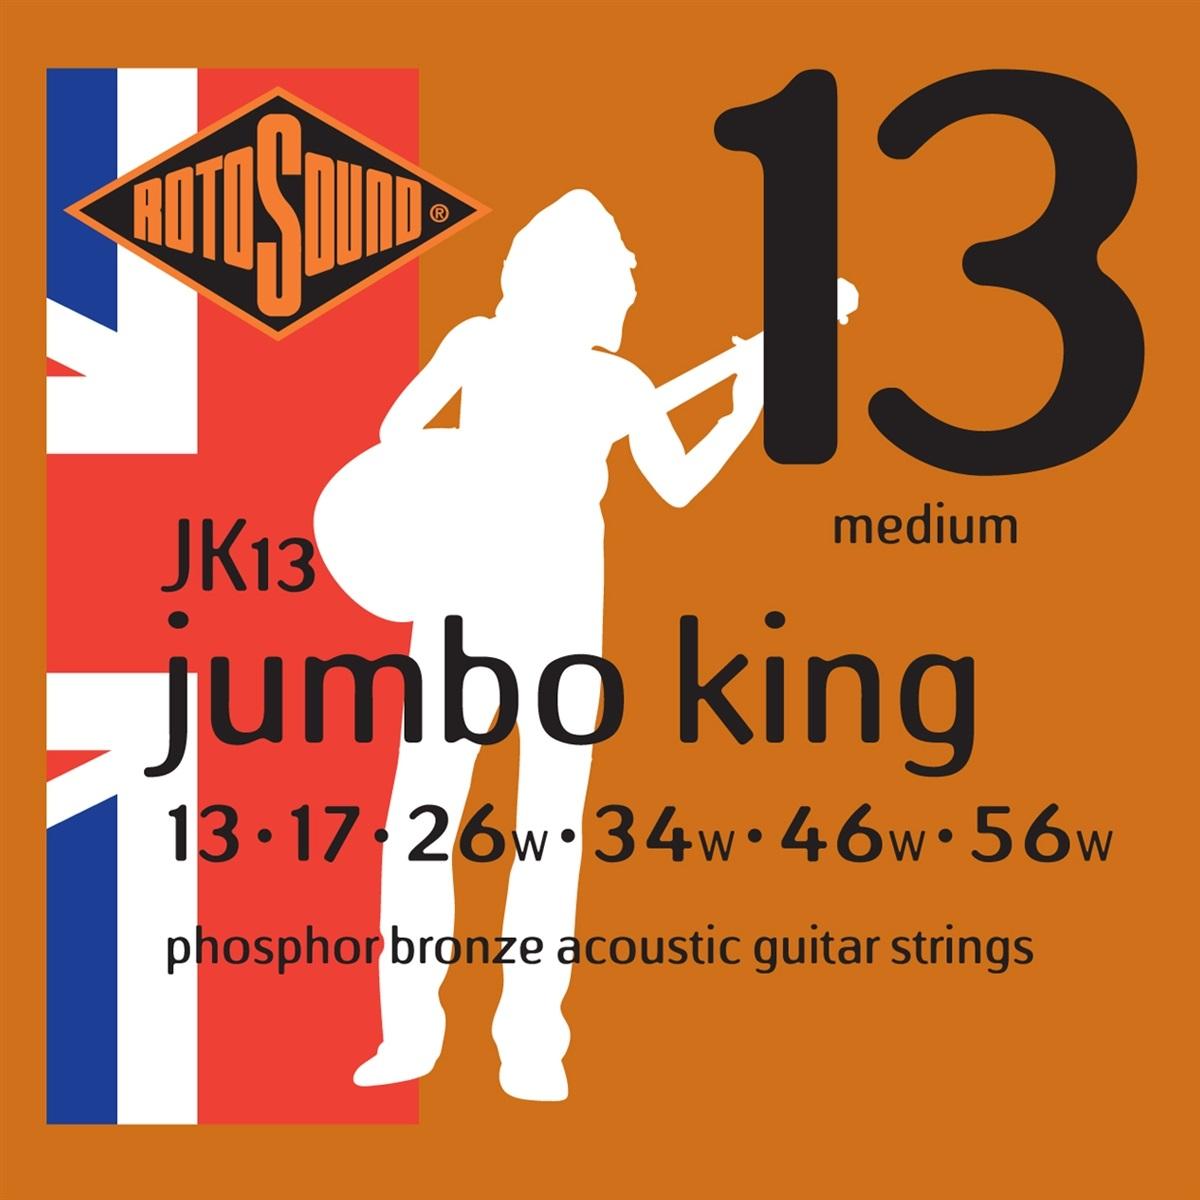 Rotosound JK13 Jumbo King